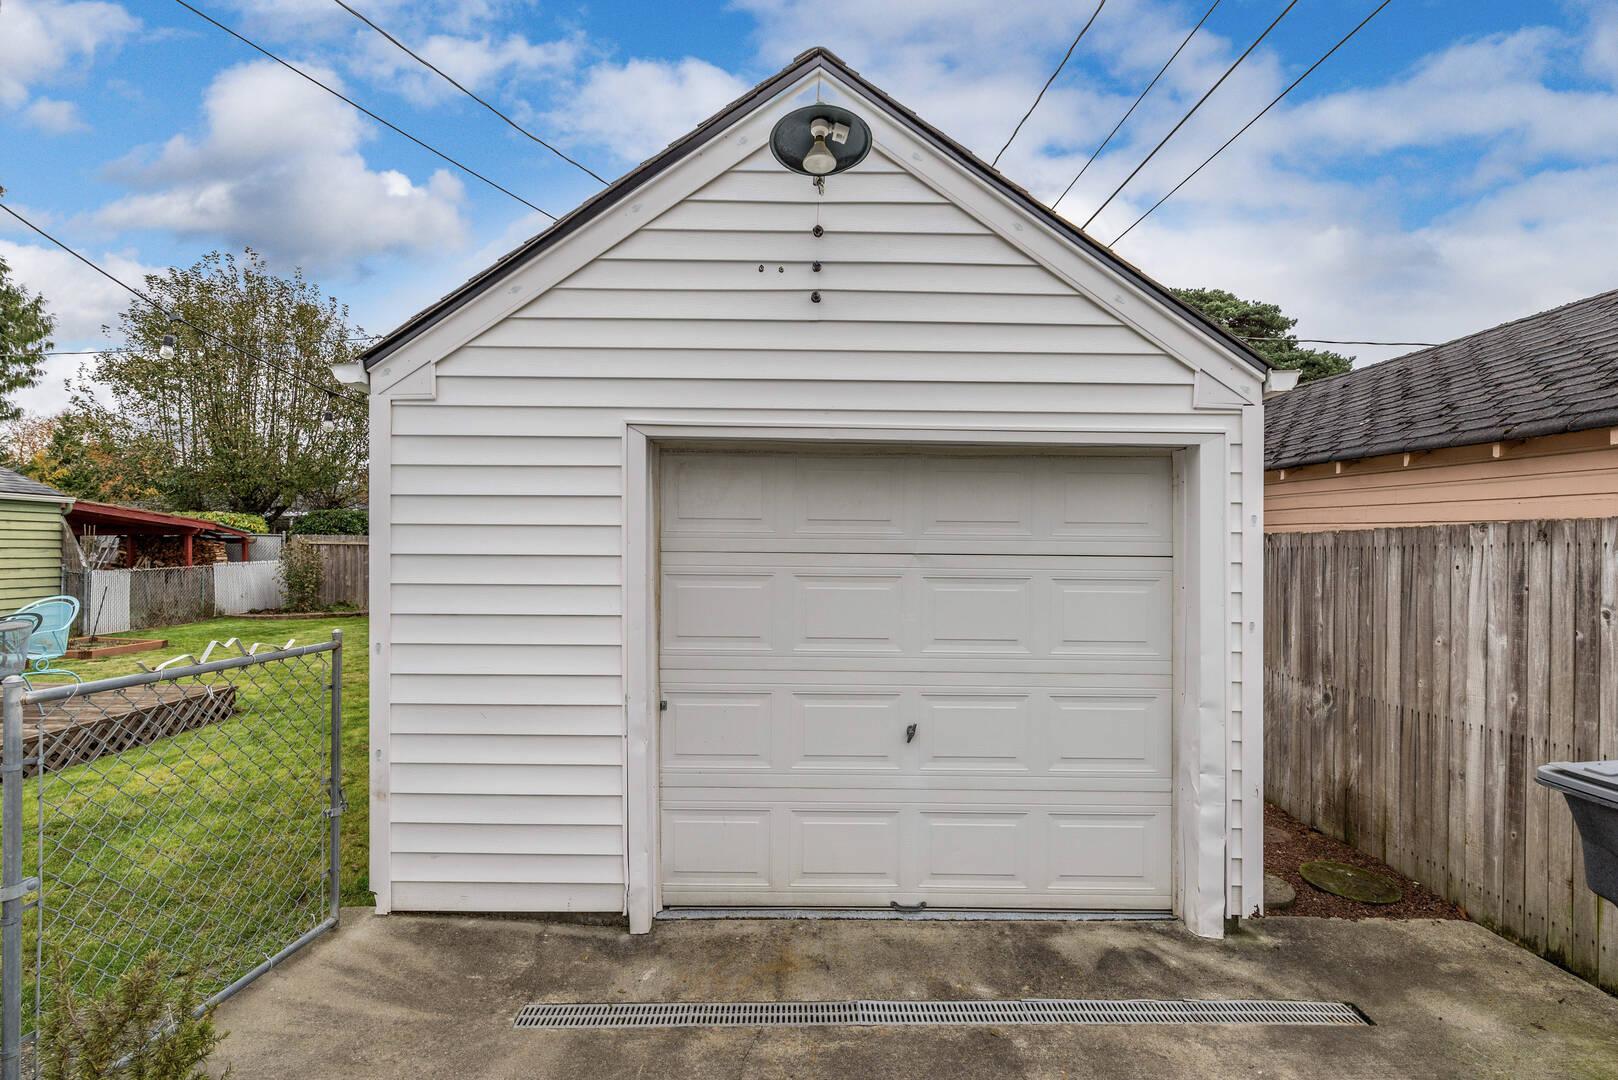 513 Chervenka Ave Sumner, WA 98390